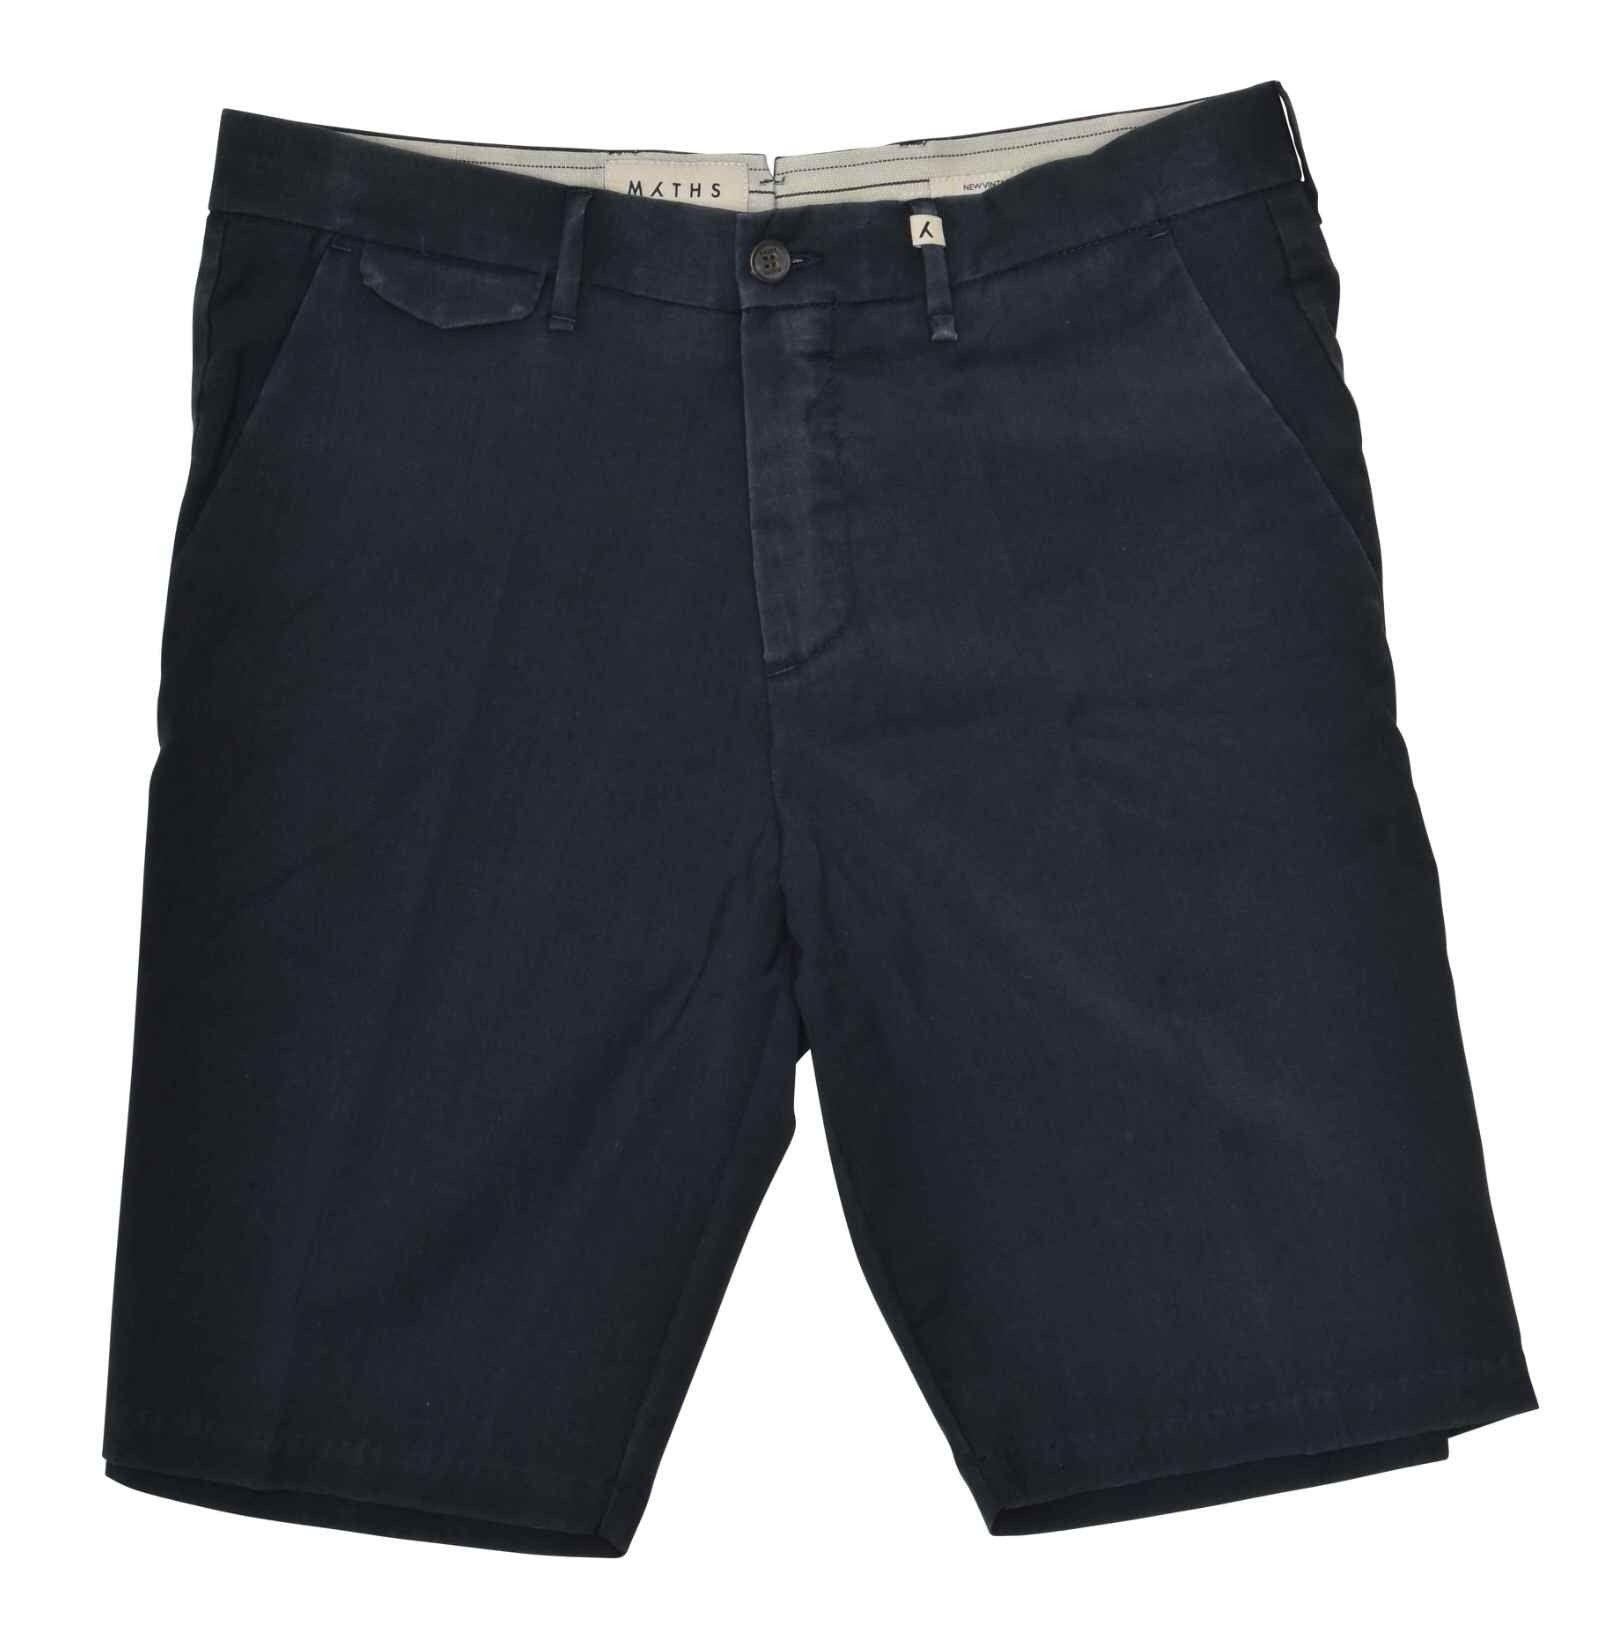 MYTHS - Herren Shorts - Short Trousers - Blu